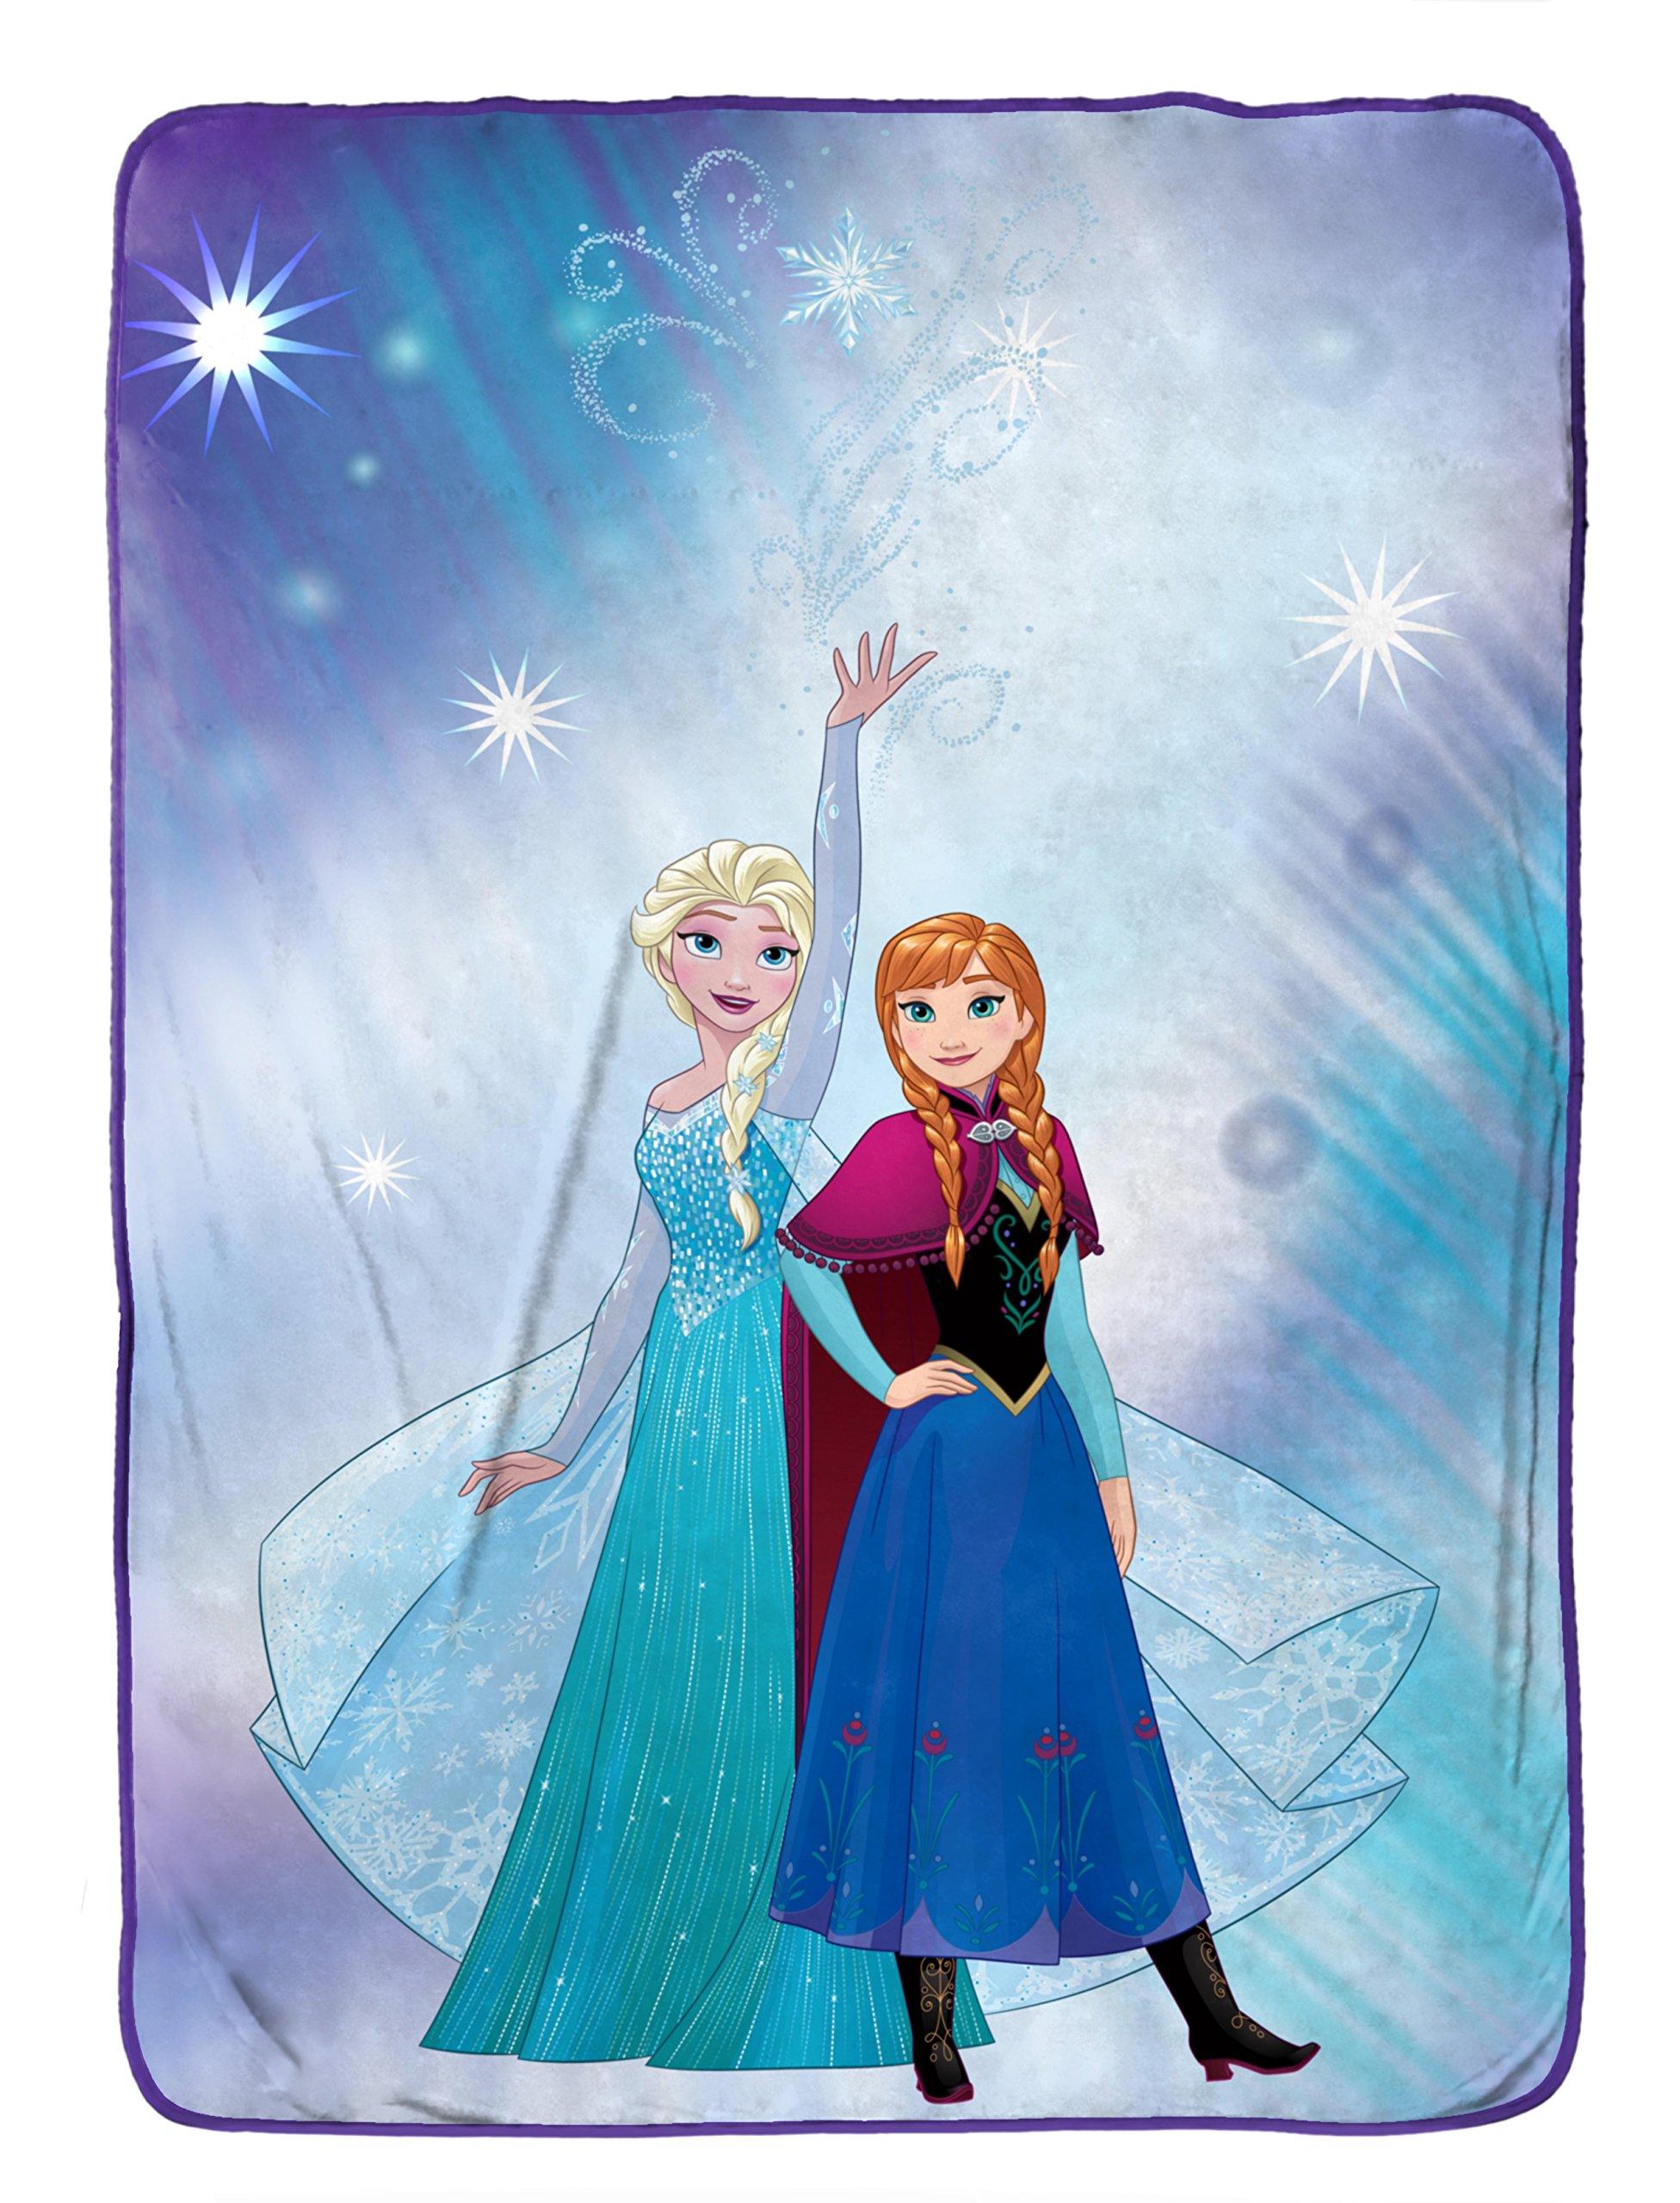 Disney Frozen 'Magical Winter' Flannel/Silk Touch 62'' x 90'' Twin Blanket